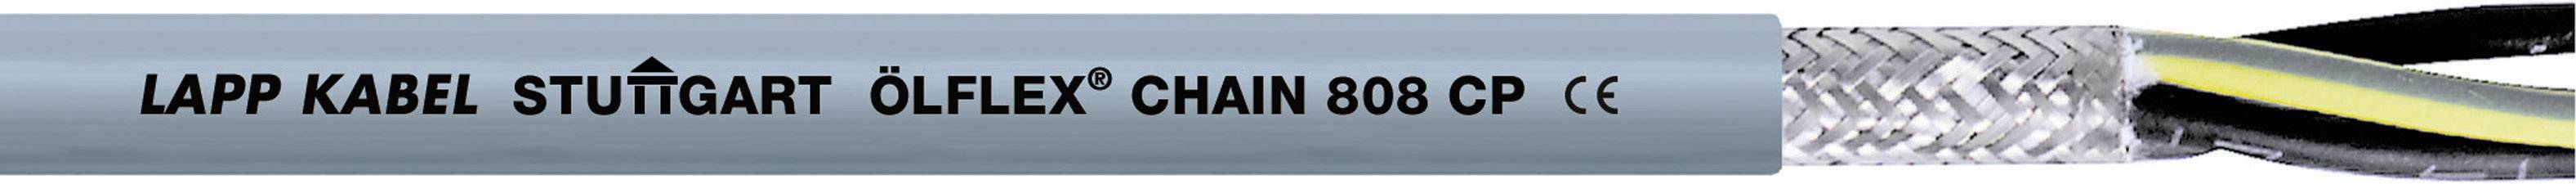 Žíla kabelu LappKabel ÖLFLEX CHAIN 808 CP 3G0,75 (1027760), 3x 0,75 mm², polyurethan, Ø 6,6 mm, stíněný, 50 m,